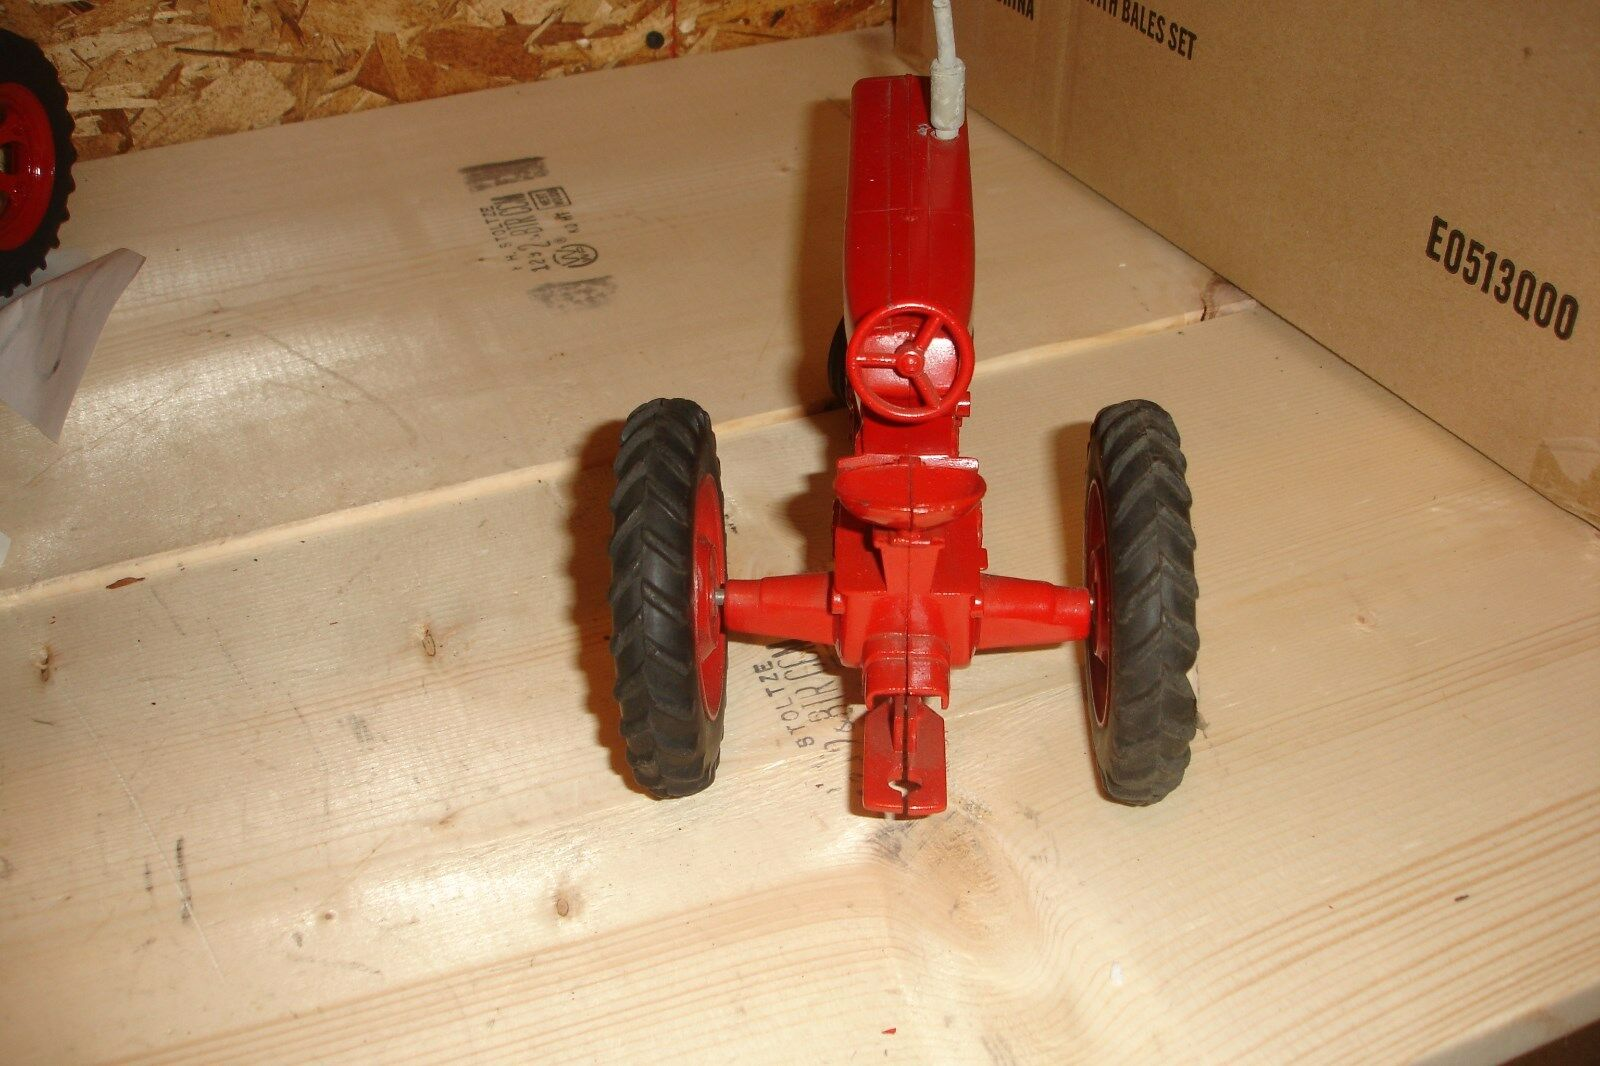 1/16 Ertl 560 toy tractor